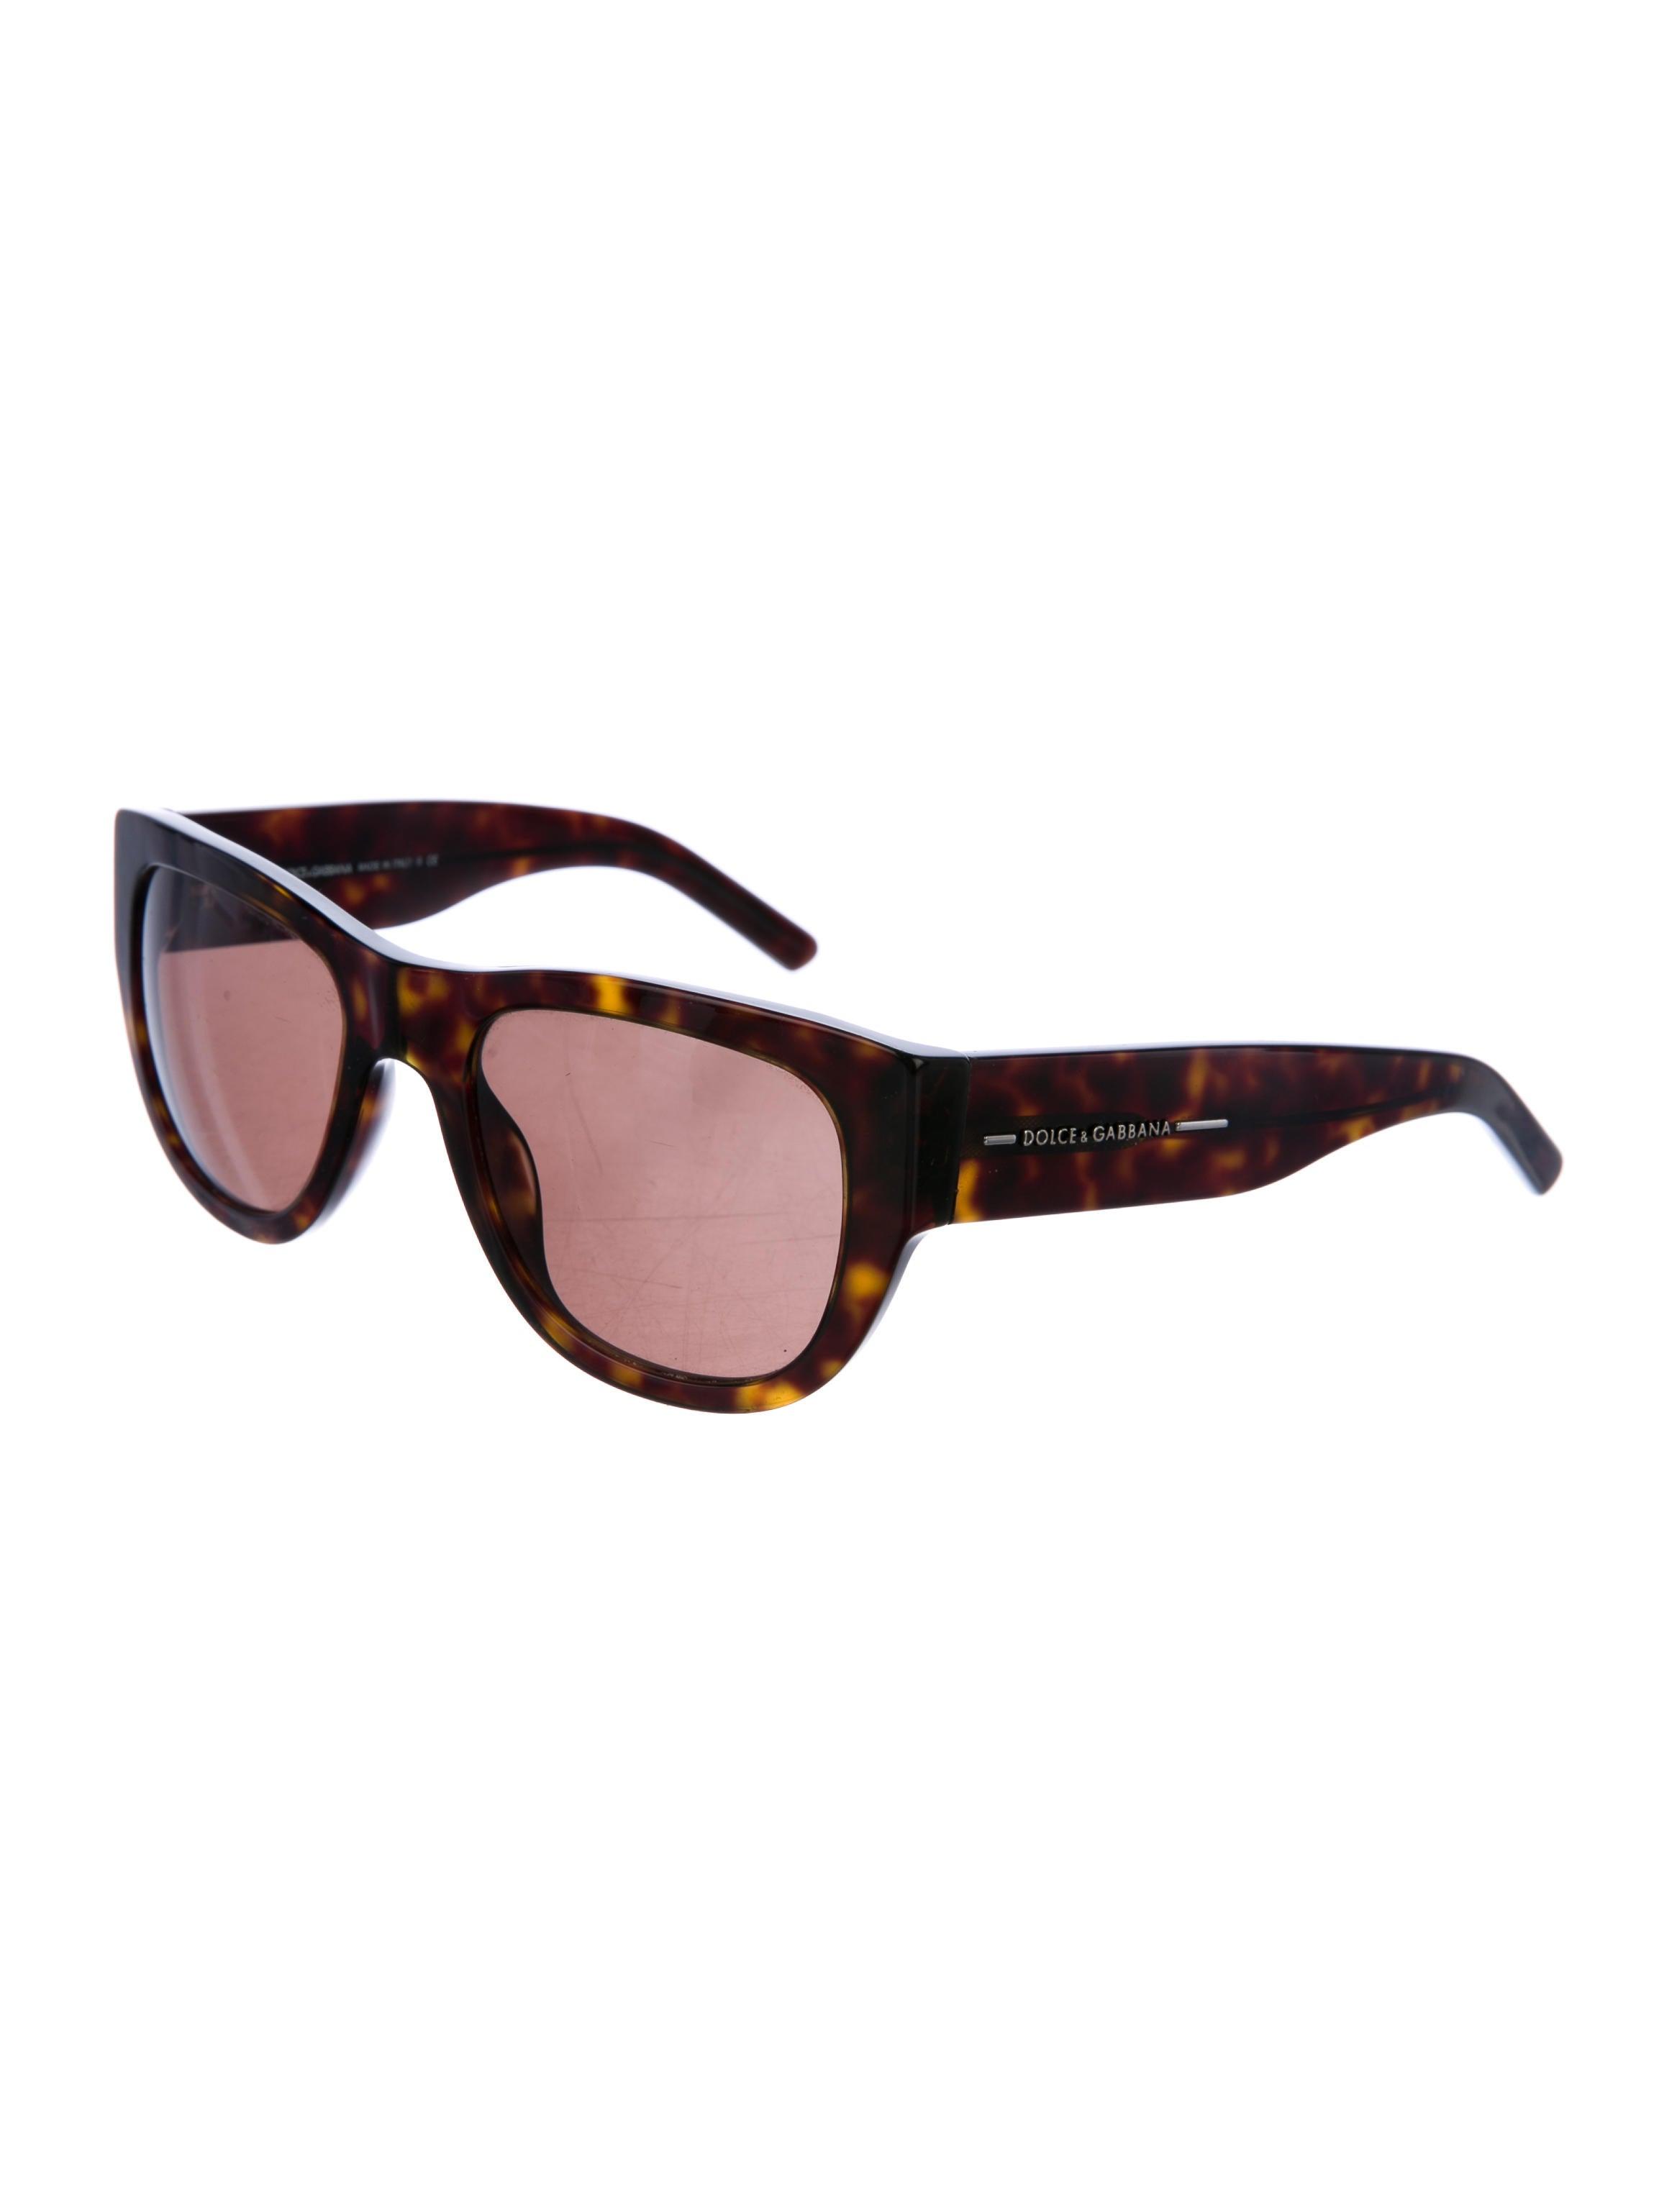 ad31535e3c71 Dolce   Gabbana Tortoiseshell Tinted Sunglasses .